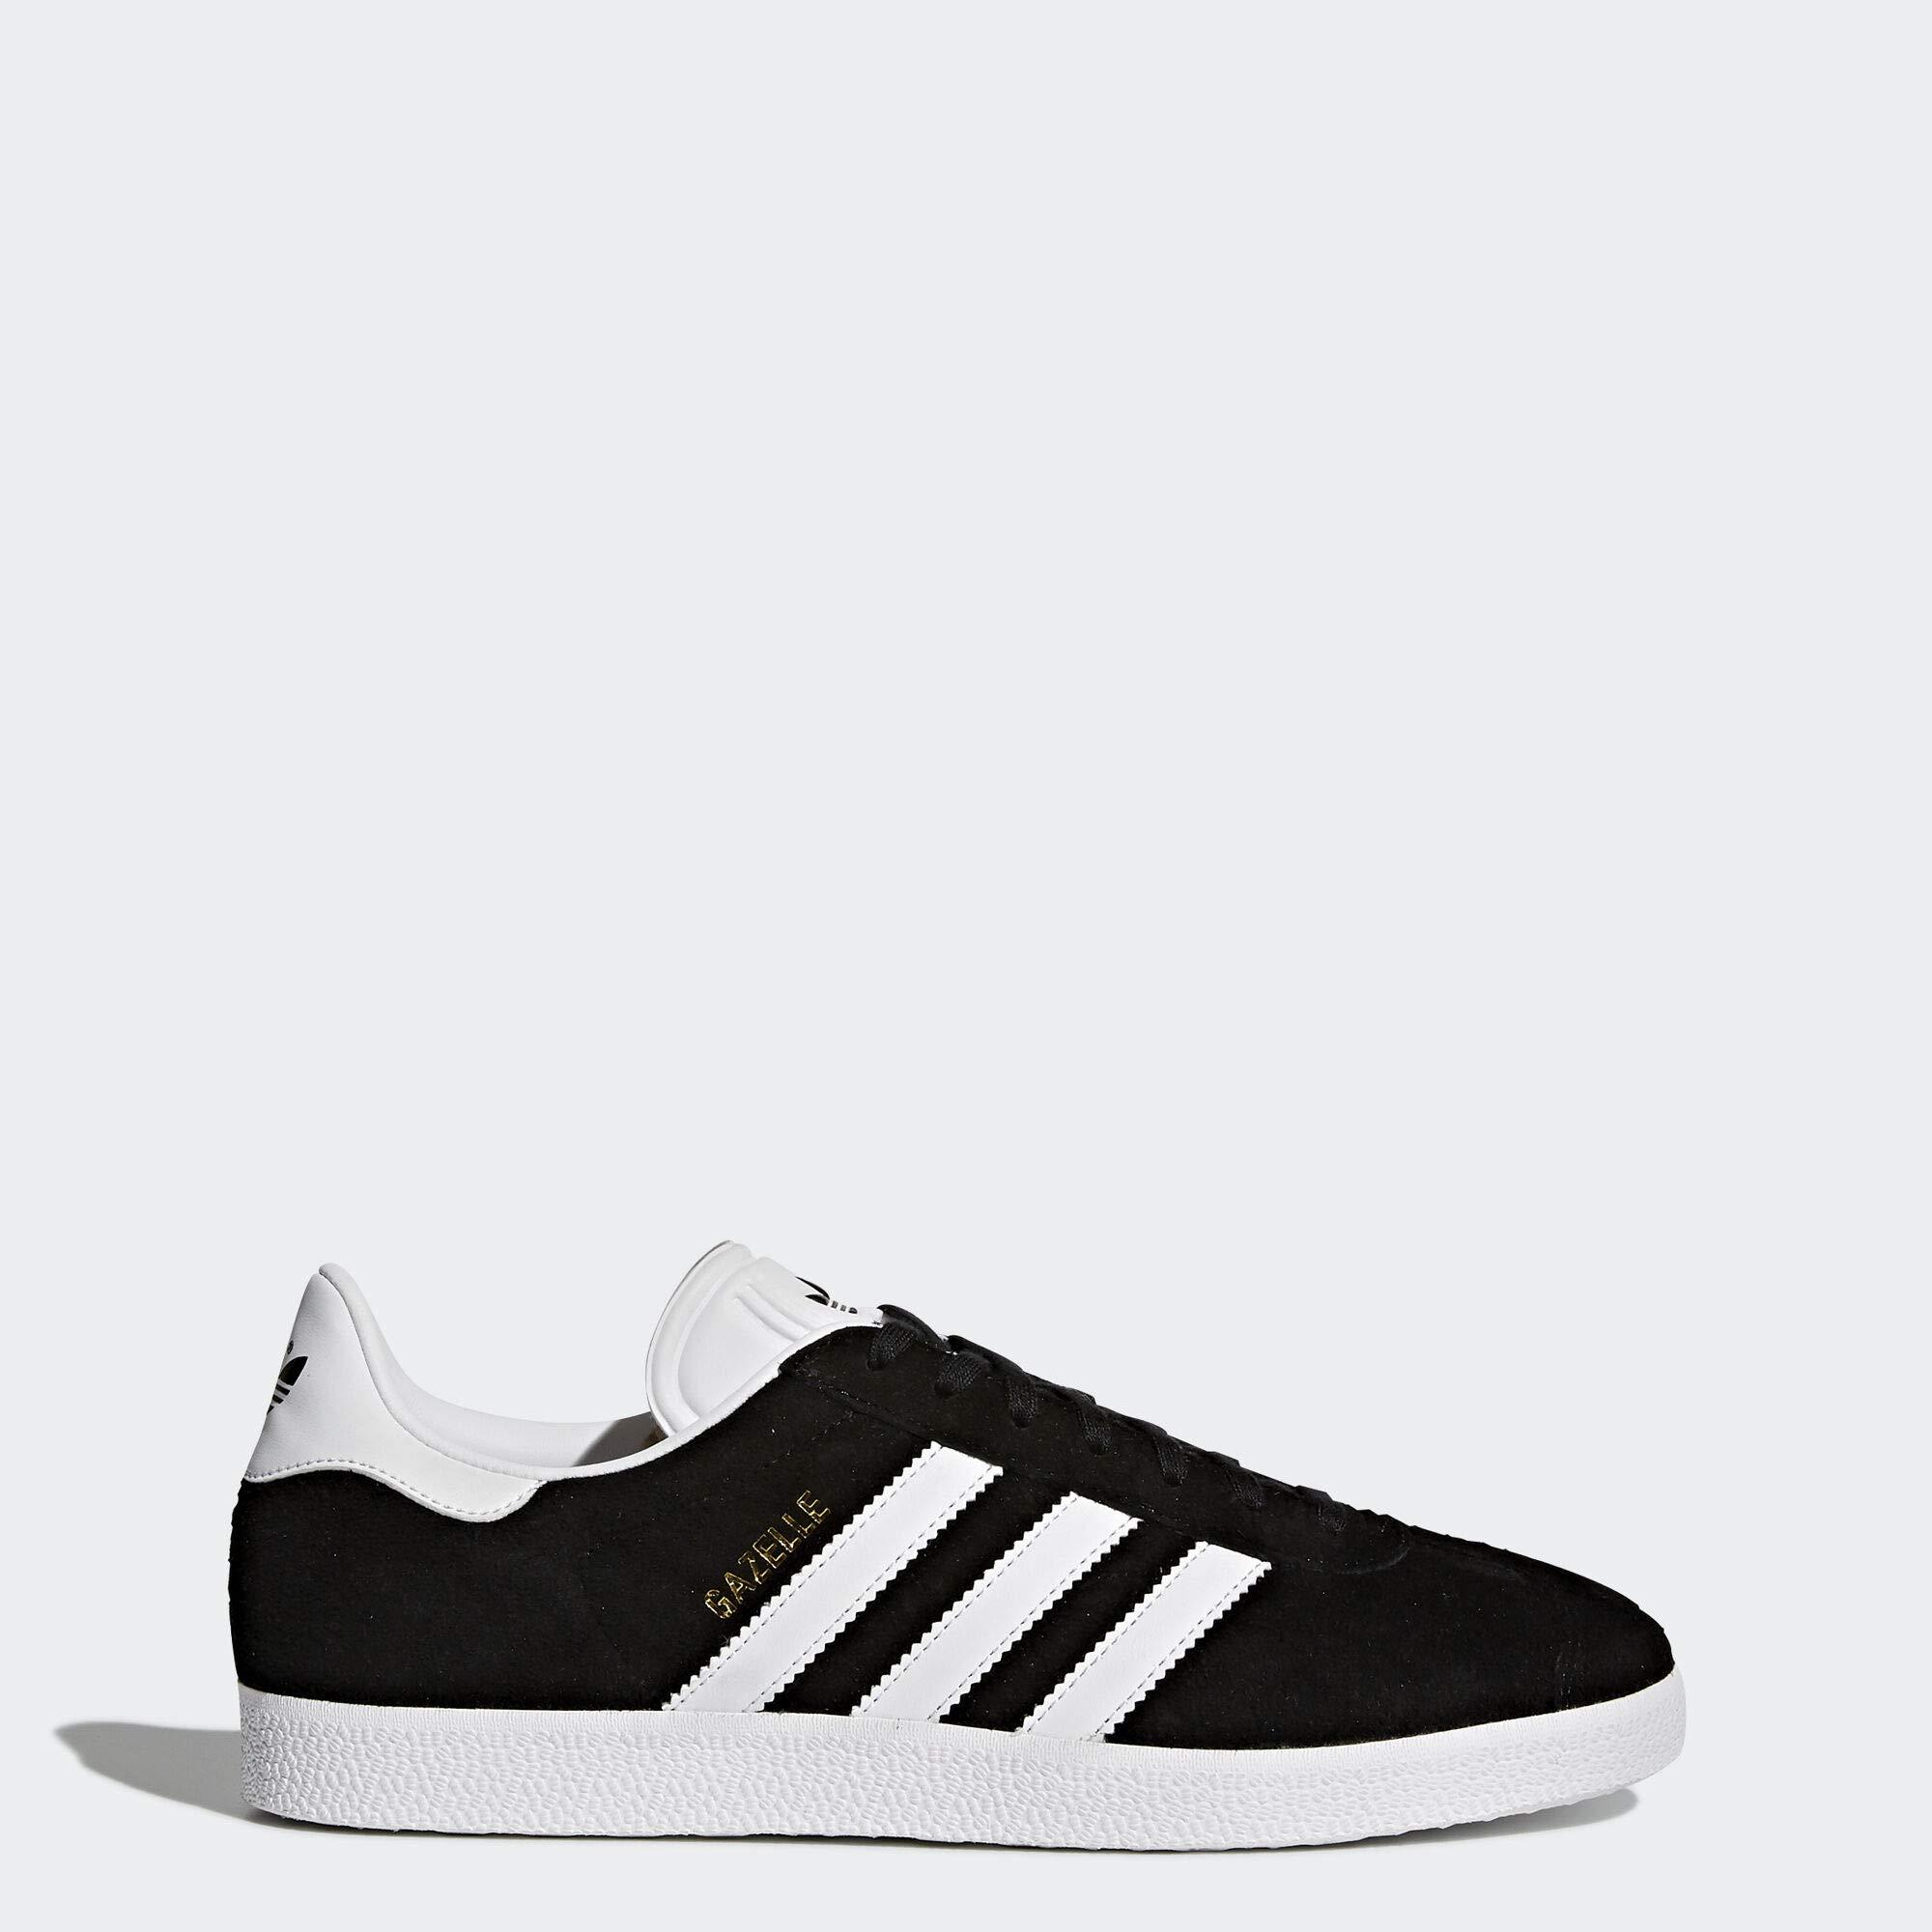 Adidas Originals Men's Gazelle Lace-up Sneaker,Black/White/Gold Met.,9 M US by adidas Originals